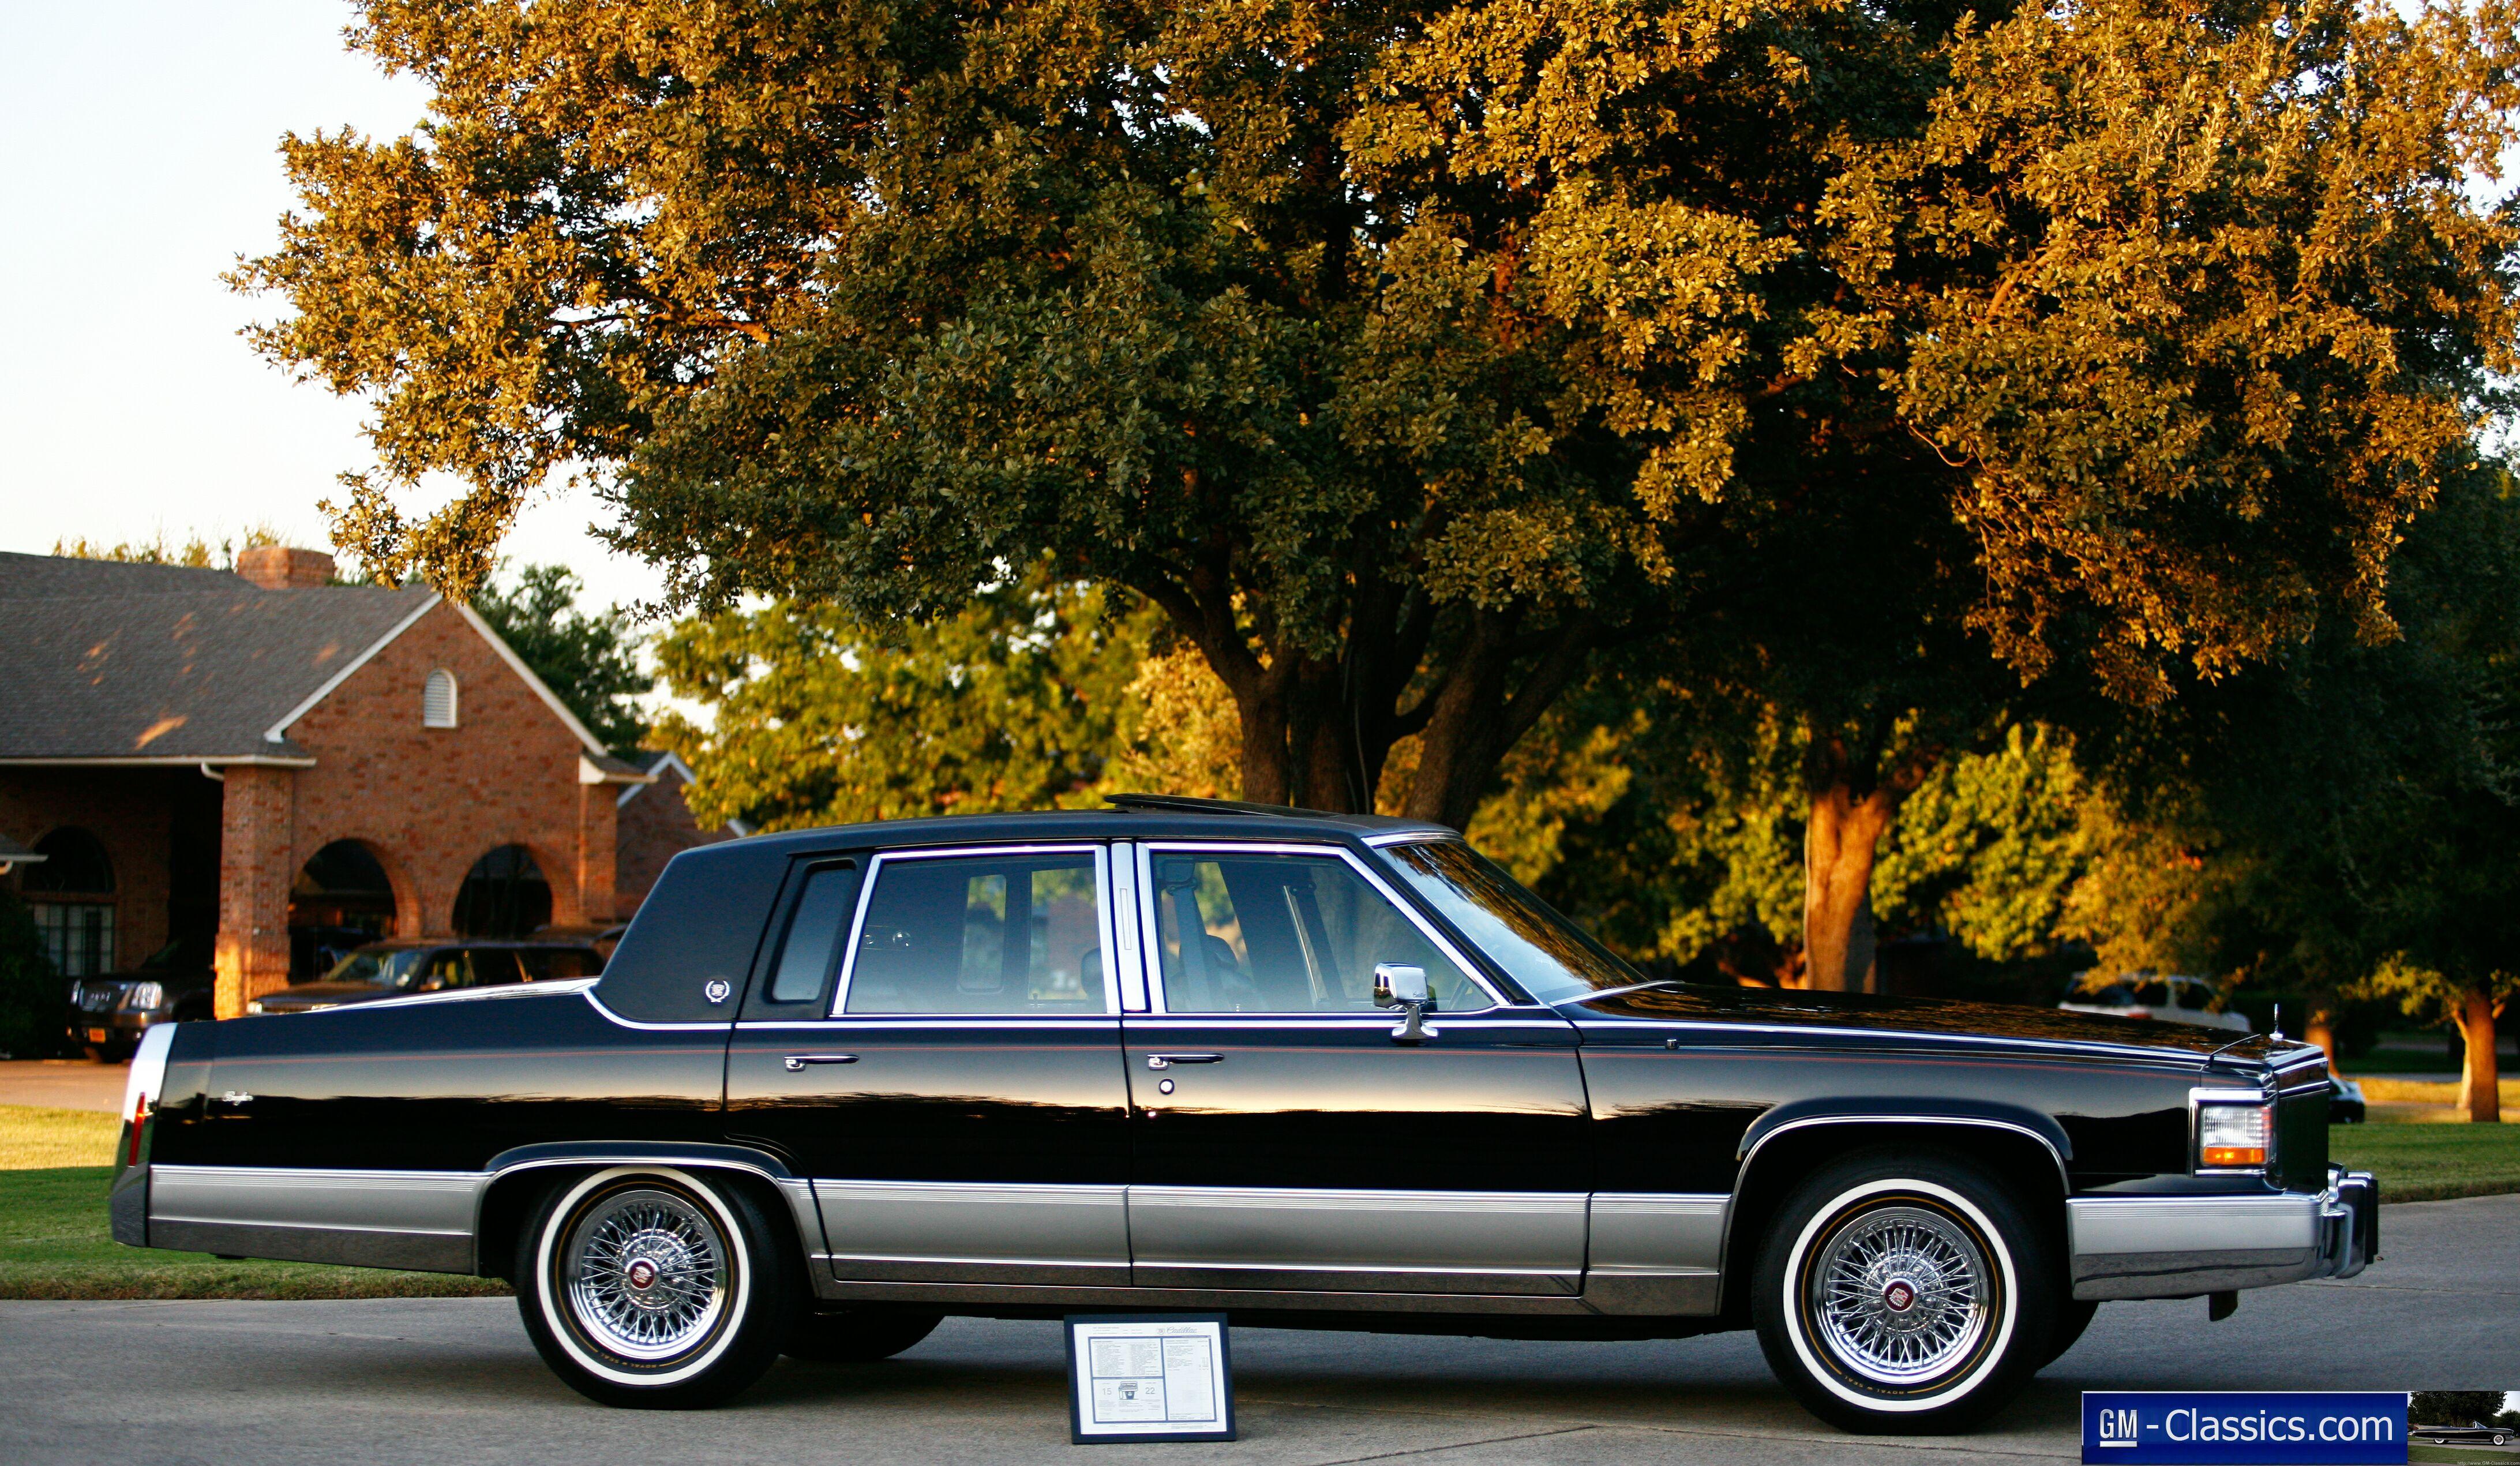 1991 Cadillac Brougham - Matt Garrett